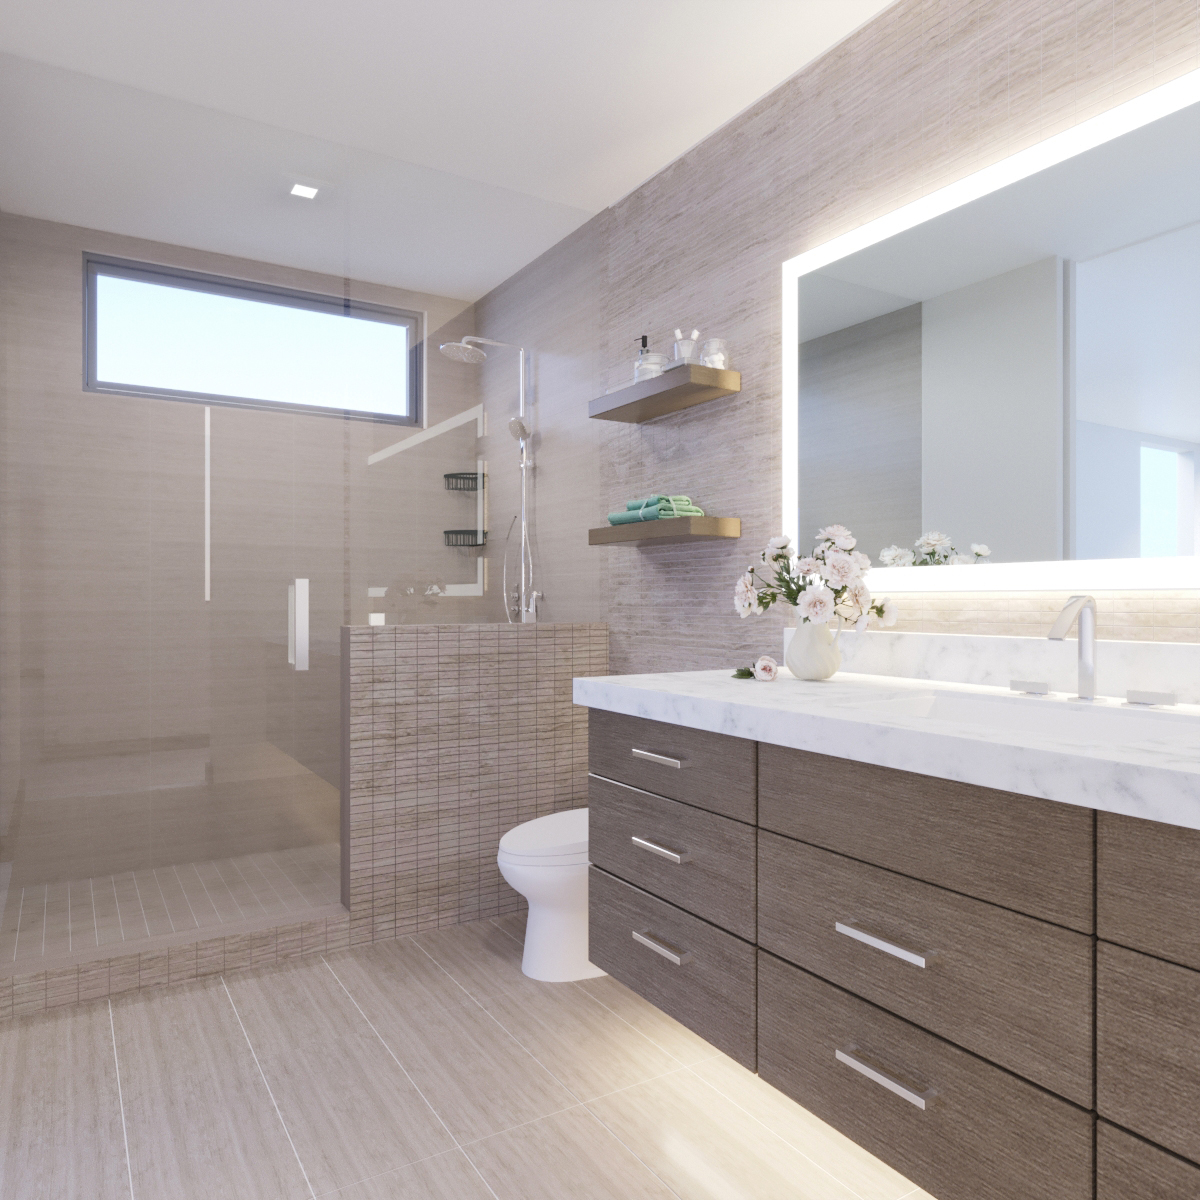 UPPER LEVEL: Bath 2